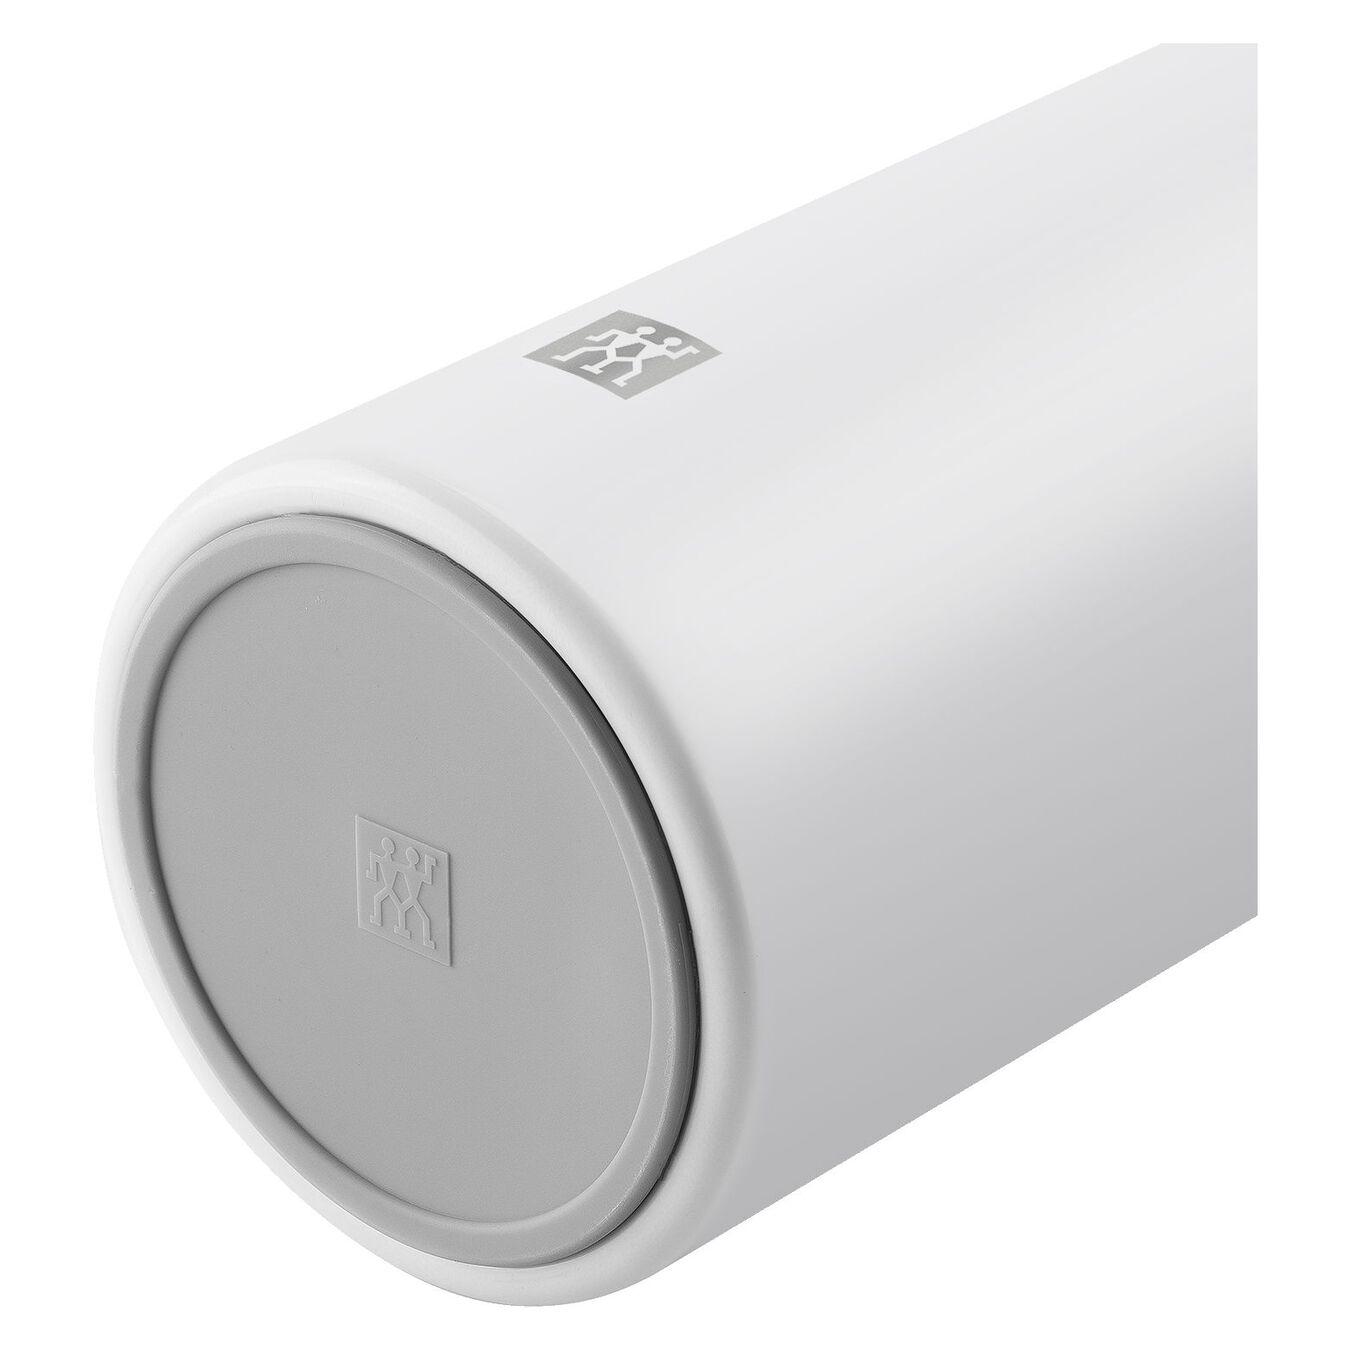 Termos Matara, 1 l | Gümüş Beyazı,,large 6